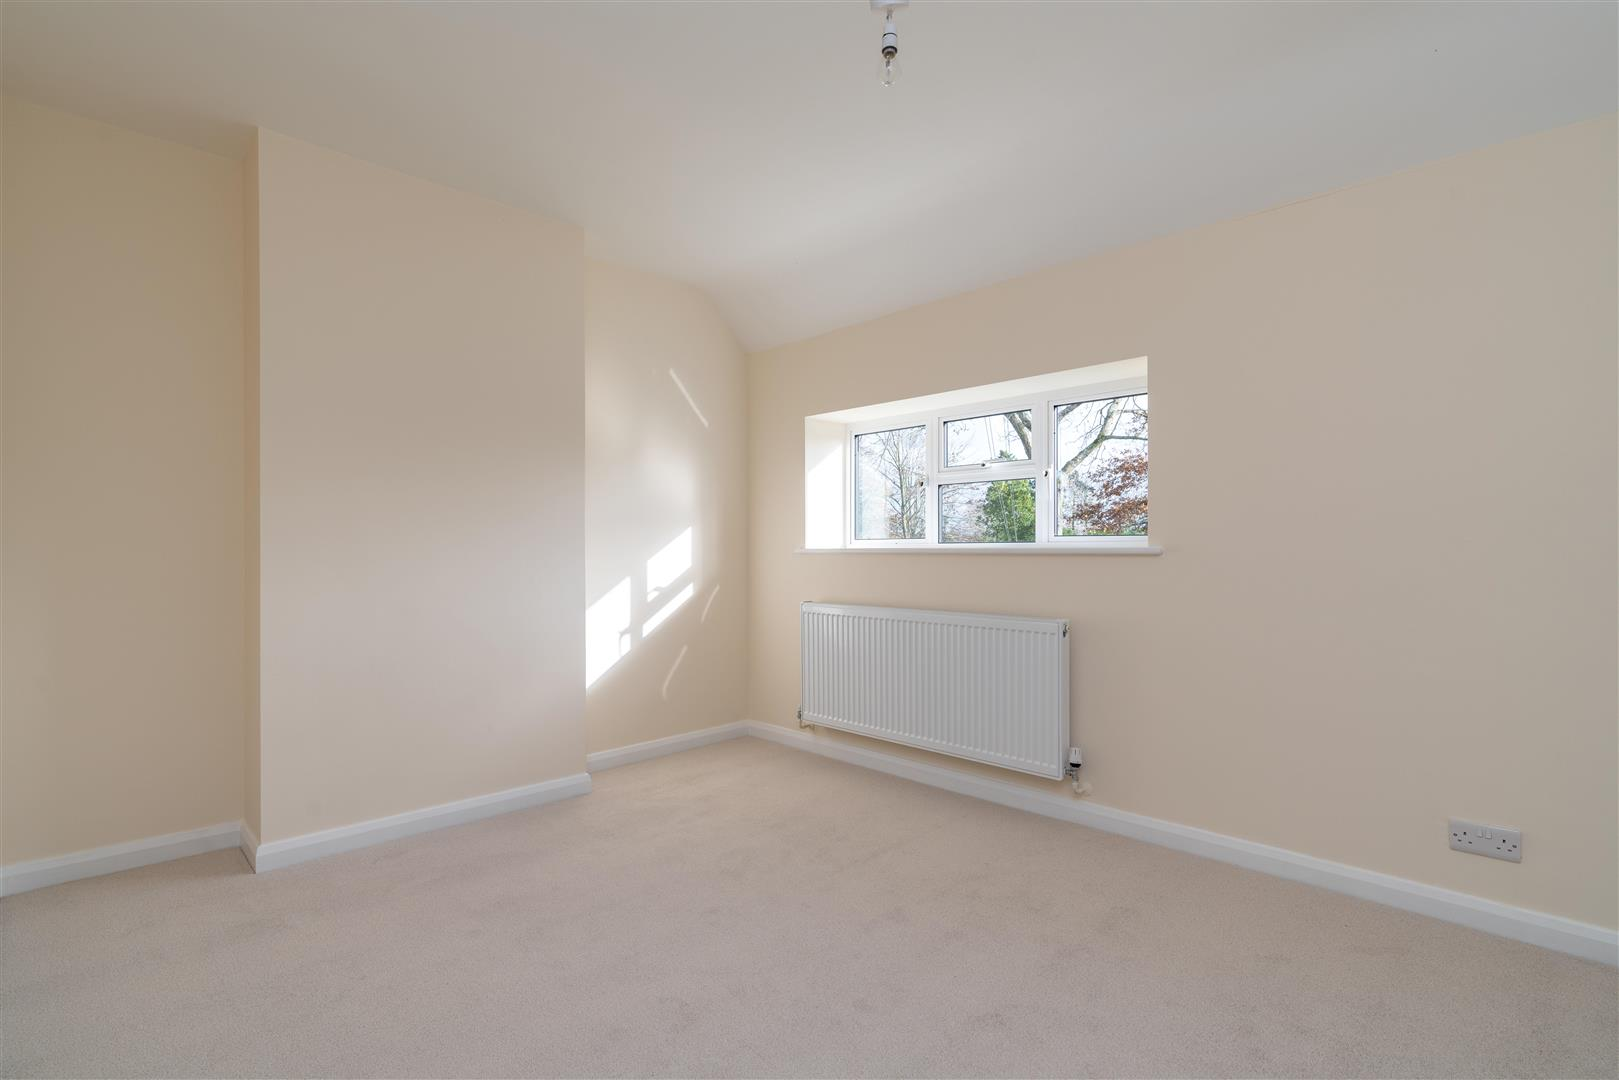 2 Little Barrow Bedroom